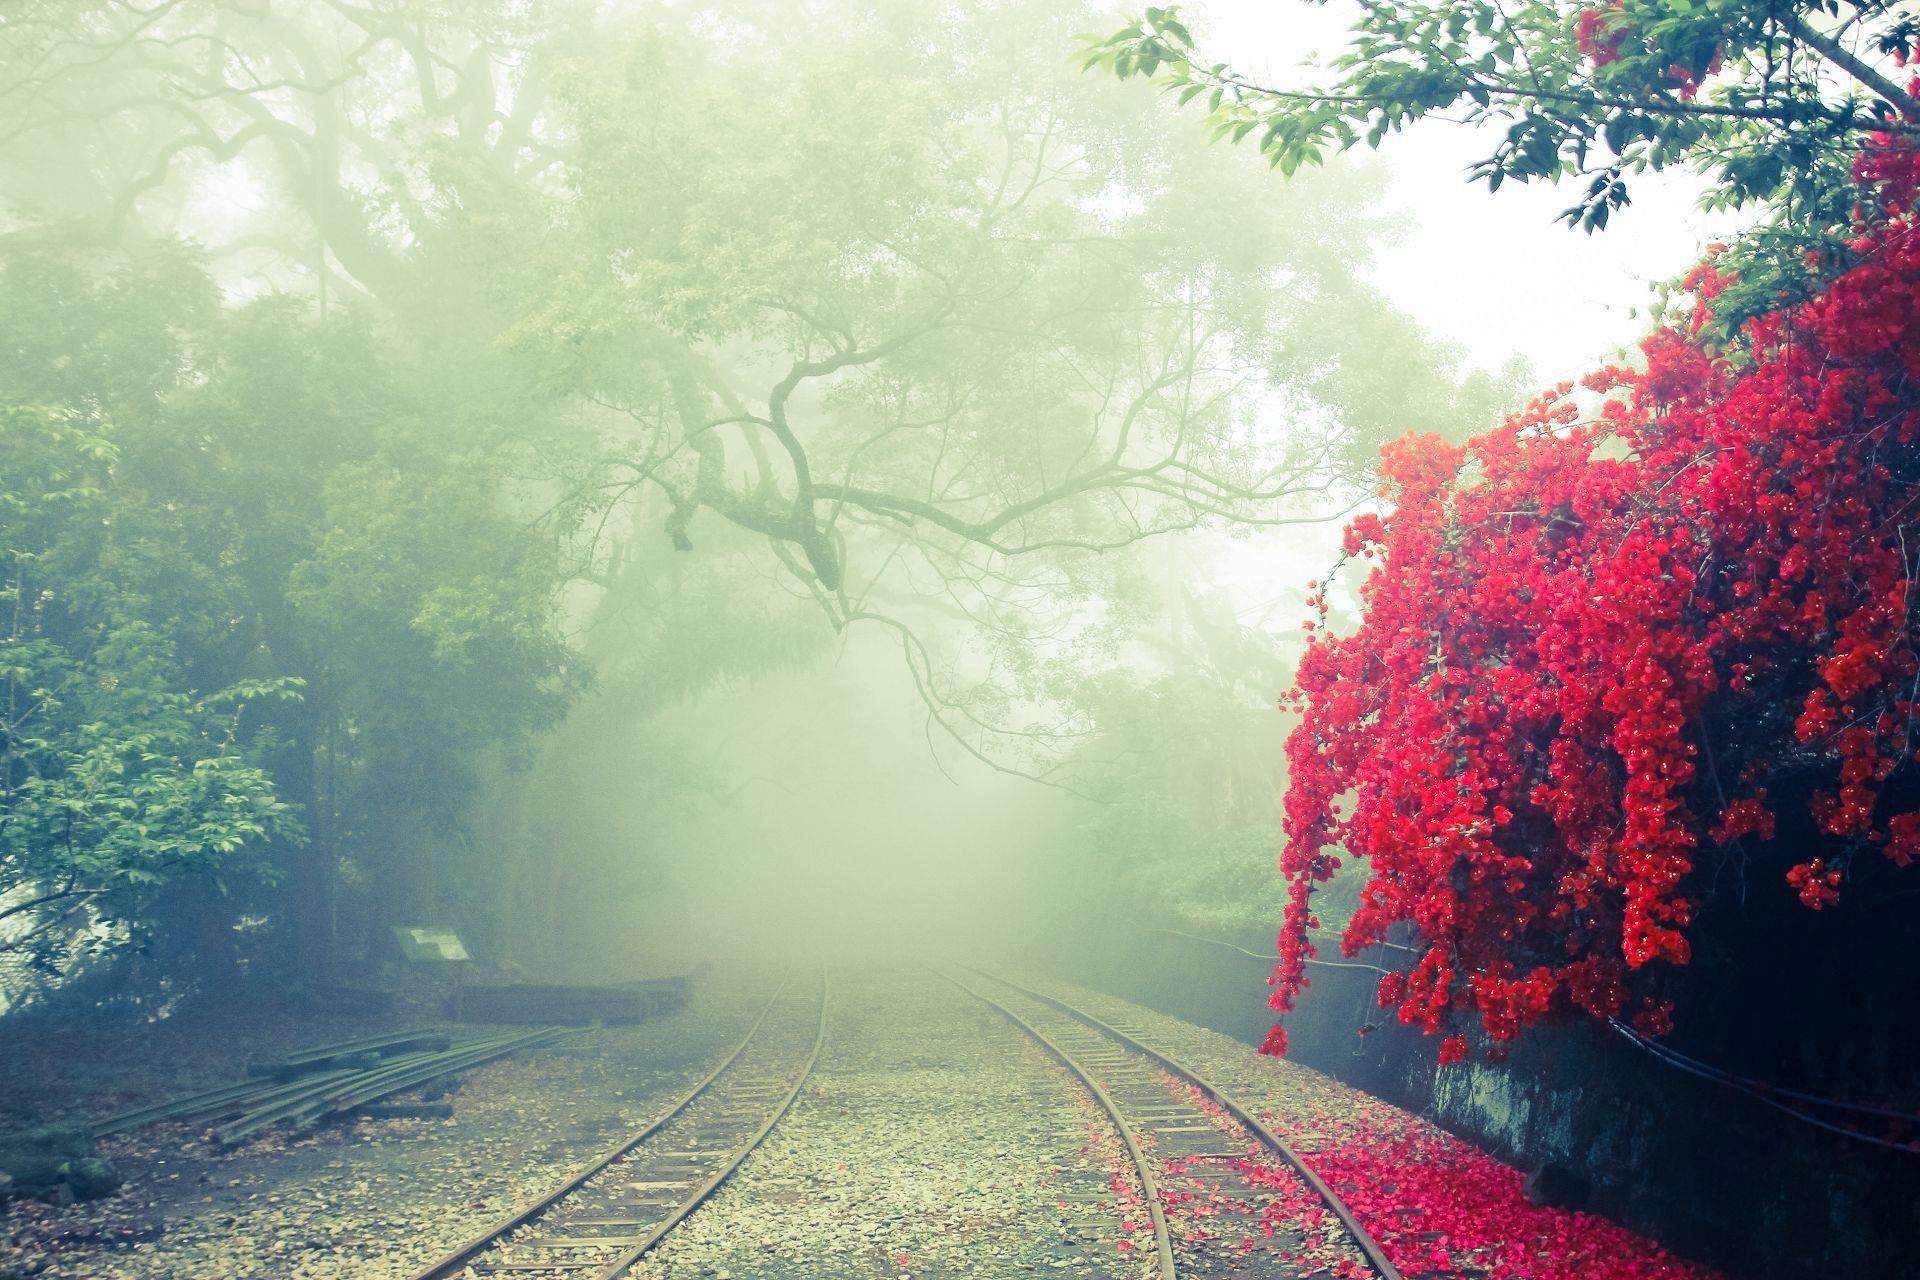 blur-branches-daylight-355296.jpg